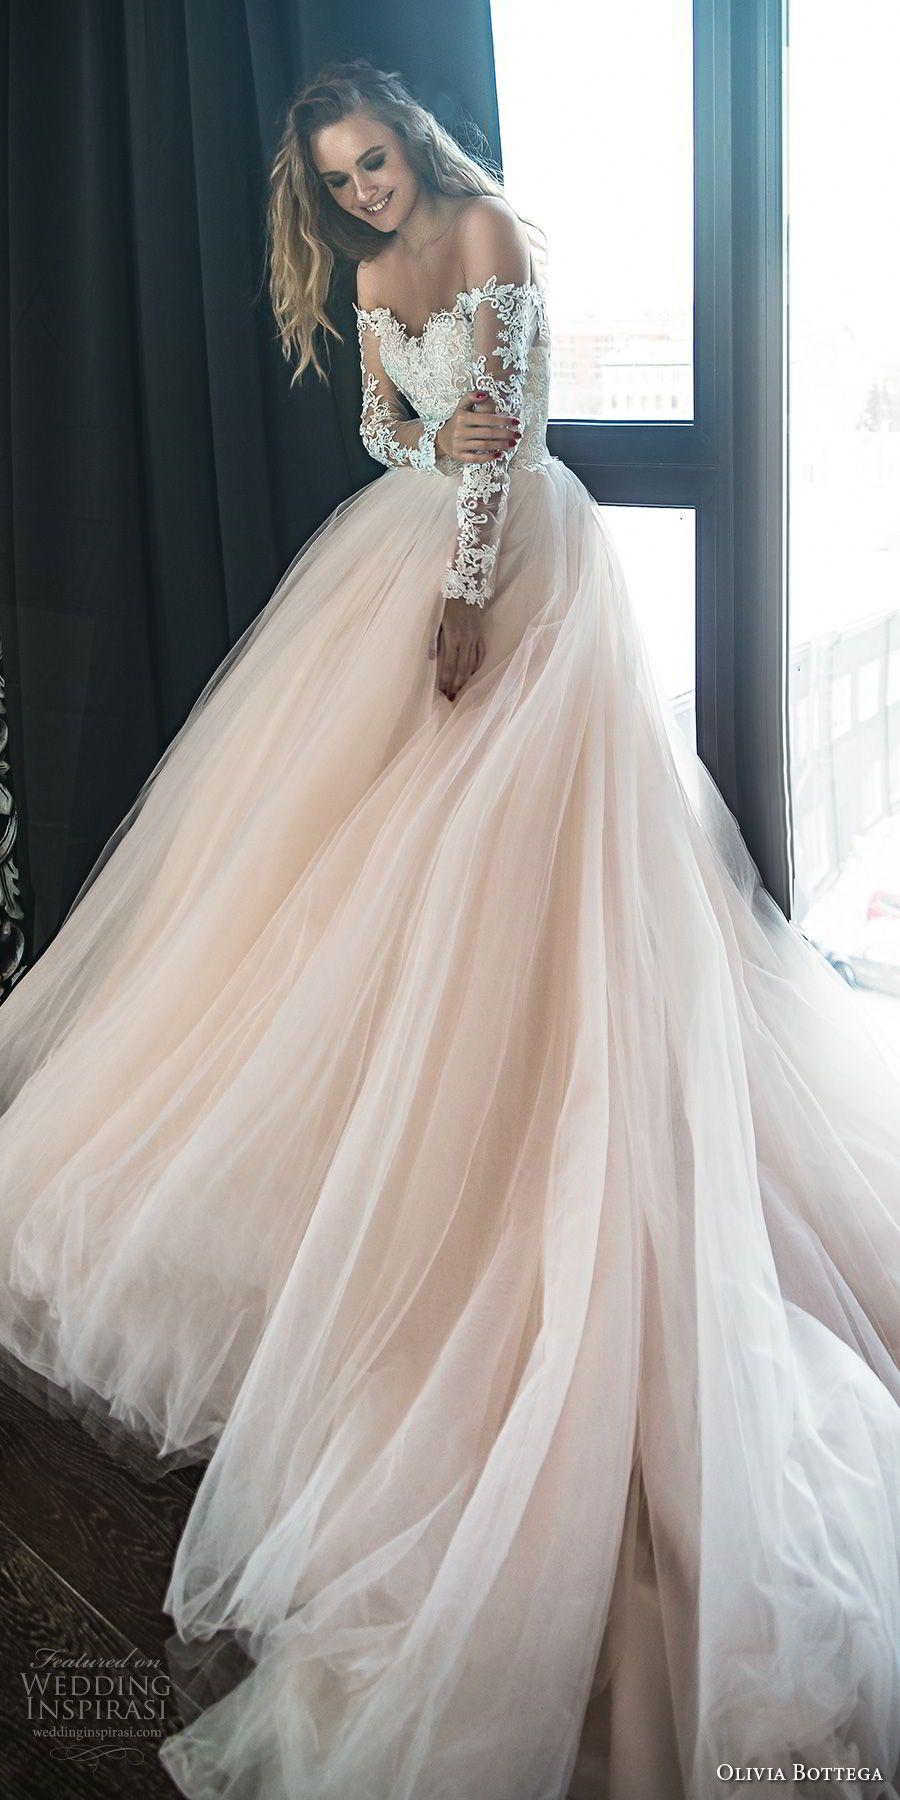 Outdoor summer wedding dresses  Eva eva on Pinterest